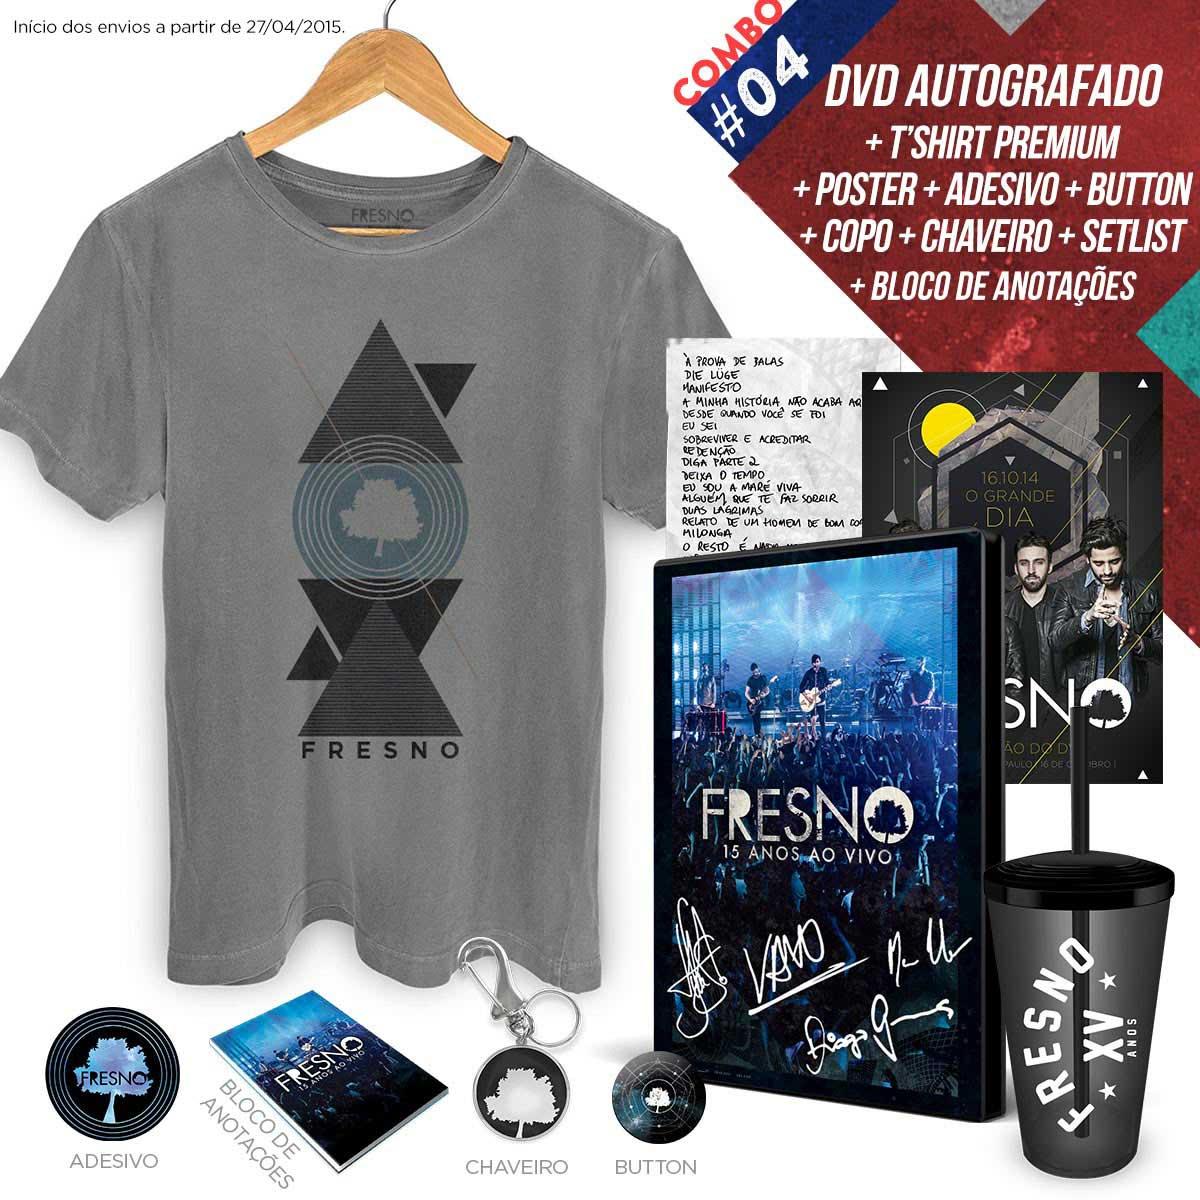 Combo Premium DVD Fresno 15 Anos ao Vivo + T-Shirt Masculina